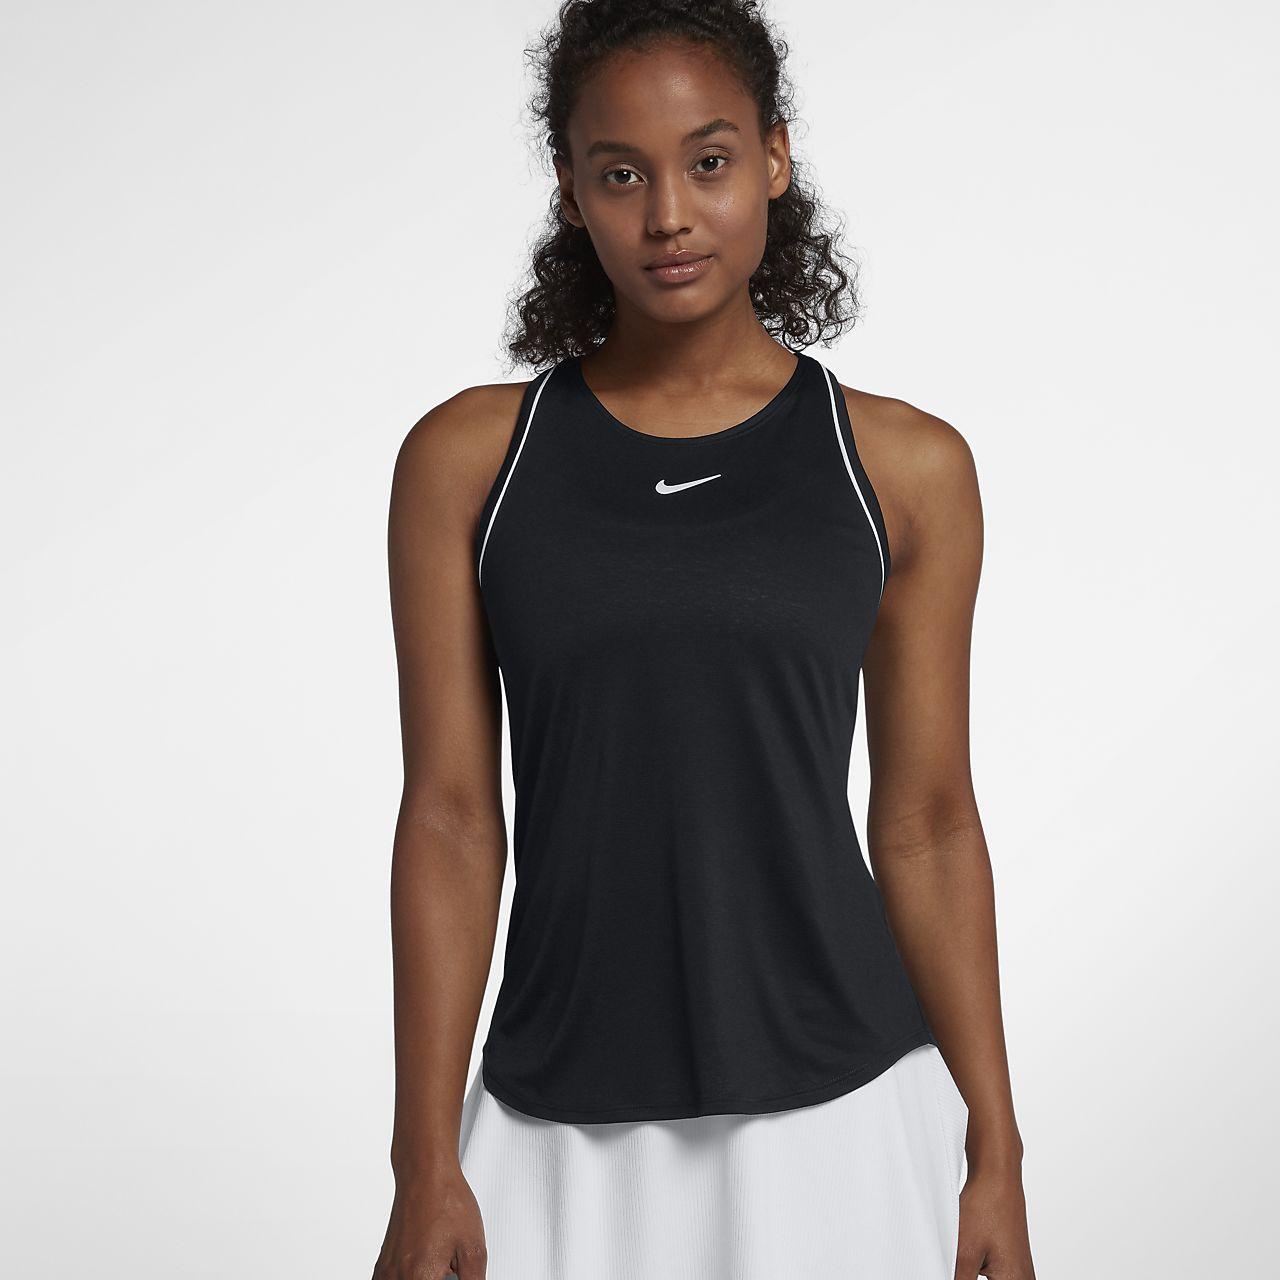 Camiseta de tirantes de tenis para mujer NikeCourt Dri-FIT